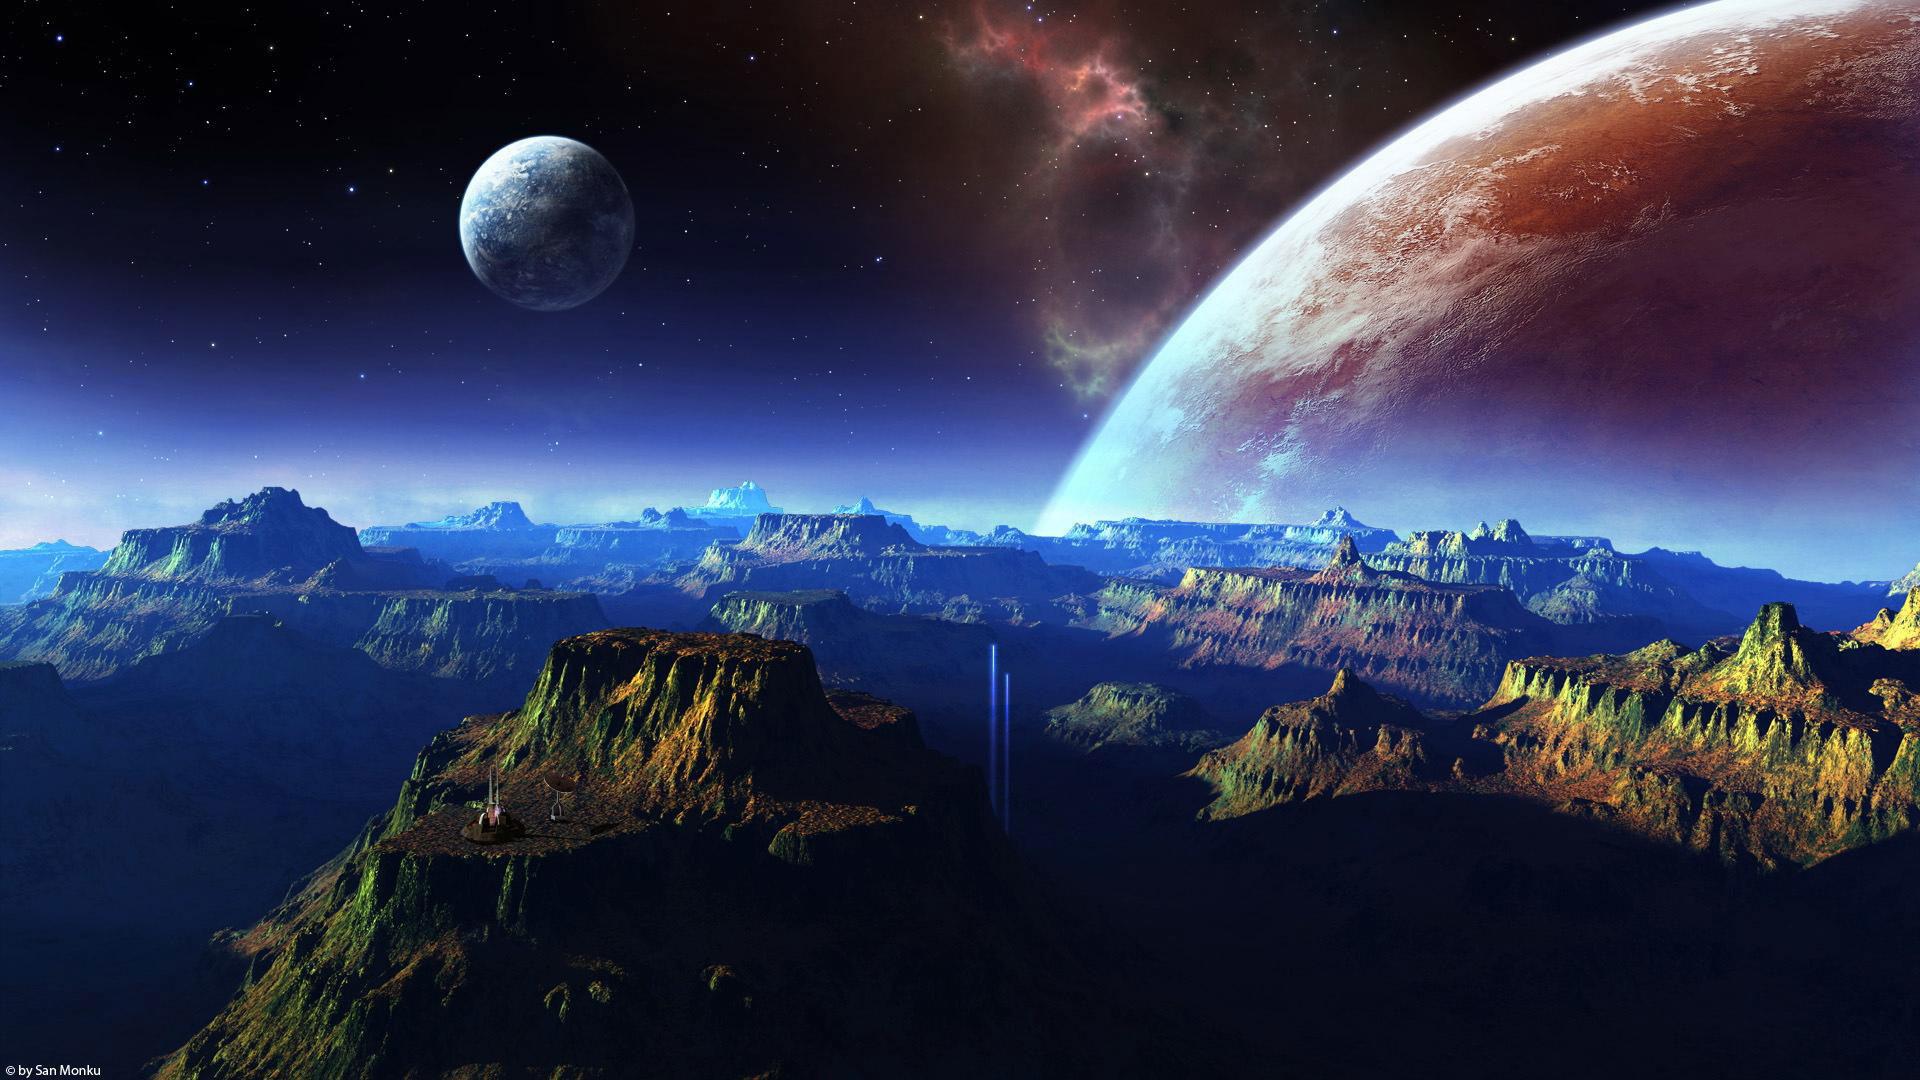 hd pics photos space big planet nebula desktop background wallpaper